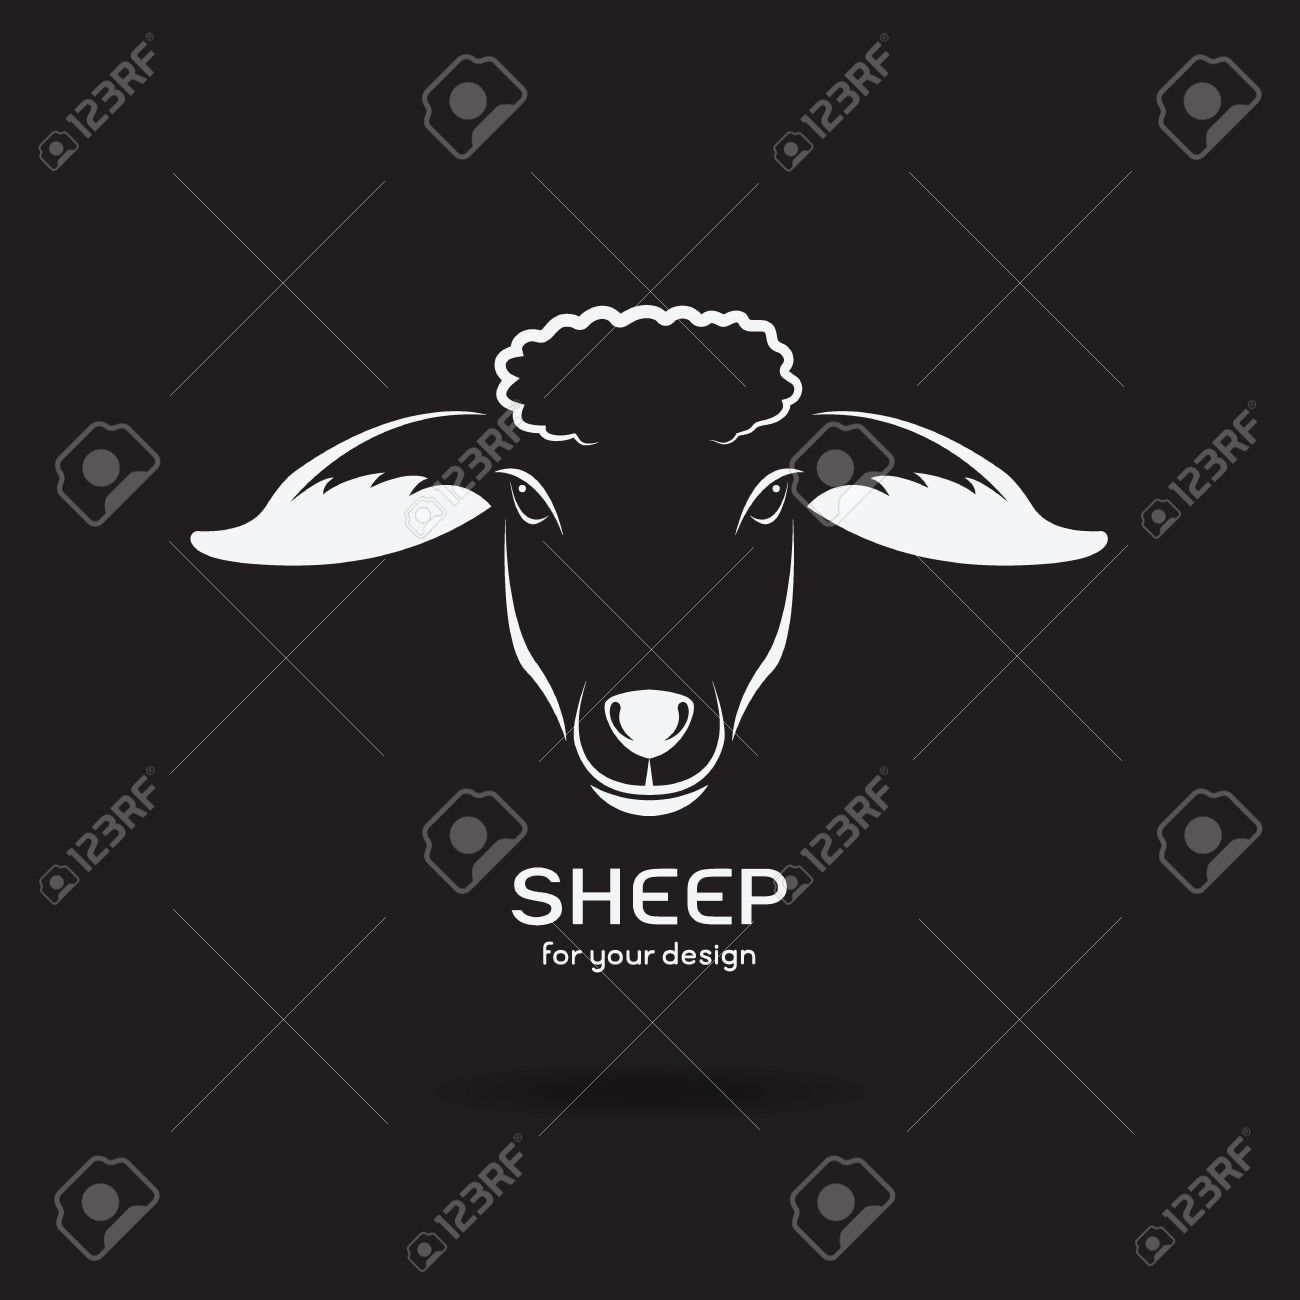 Vector Image Of A Sheep Head Design On Black Background Logo Farm